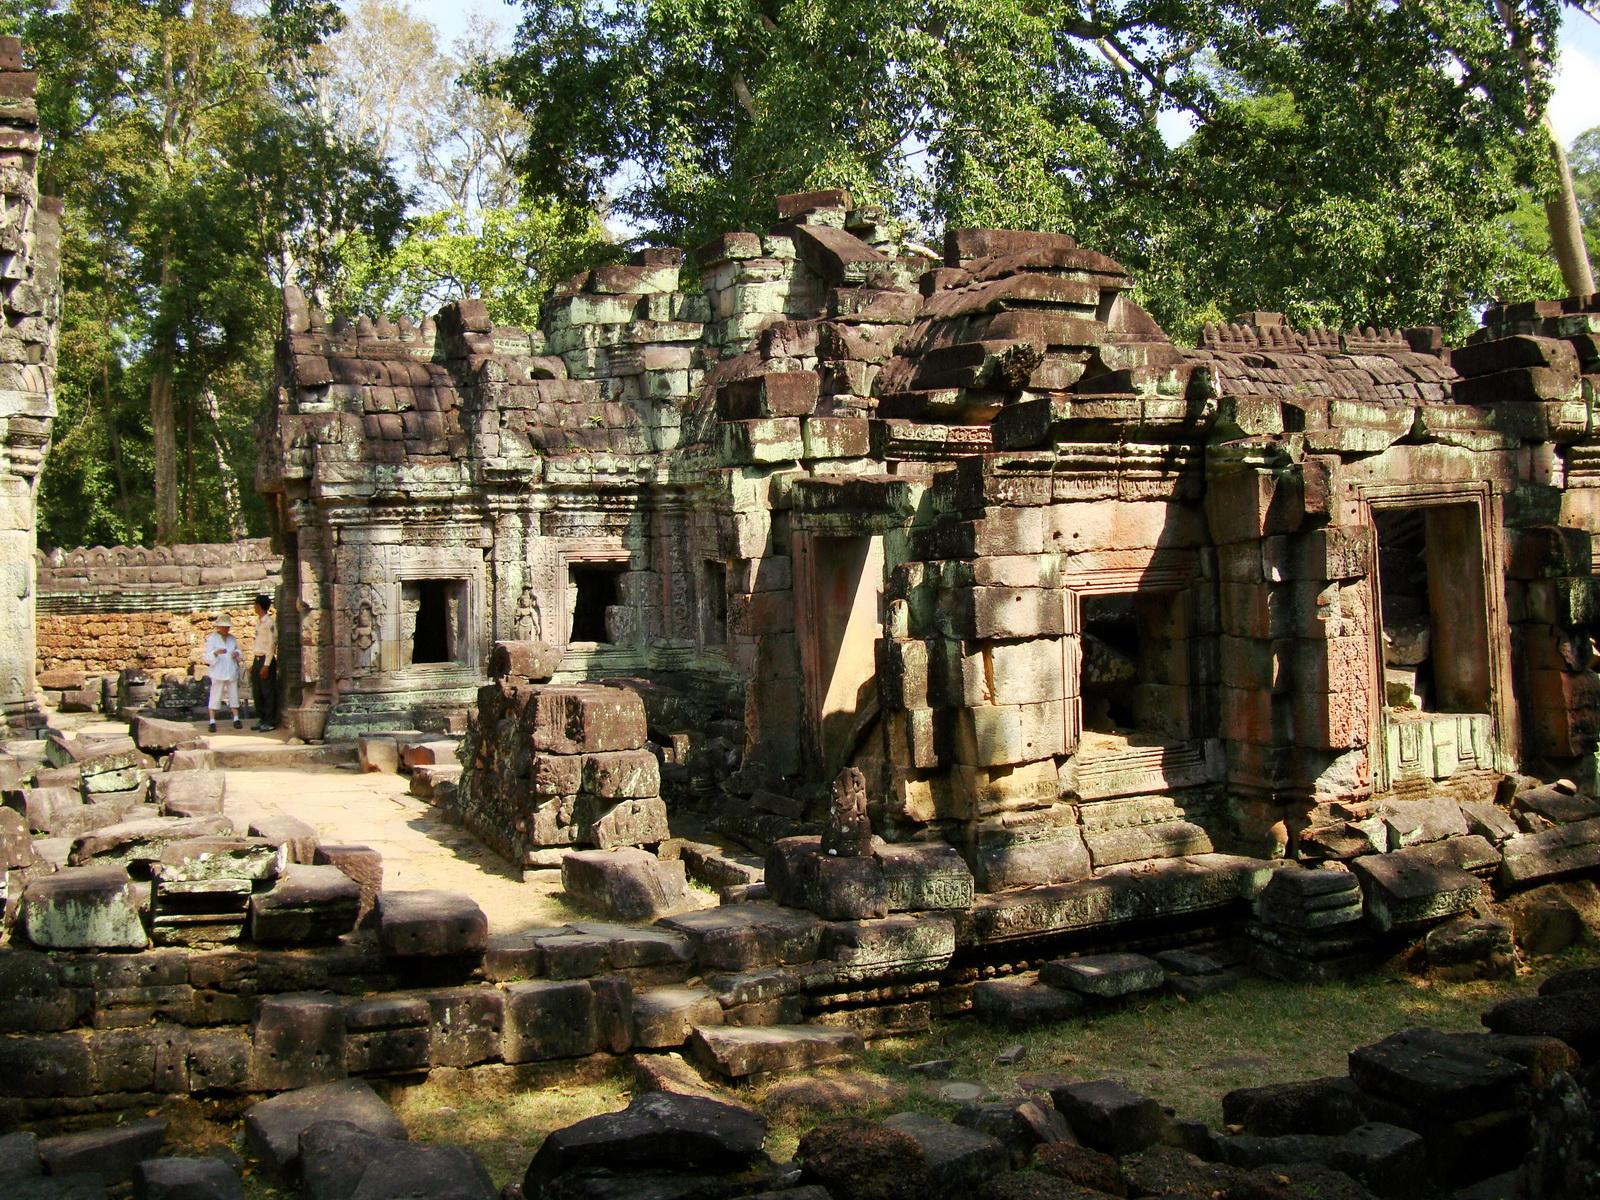 Preah Khan West Vishnu temple Angkor Thom Preah Vihear province 02